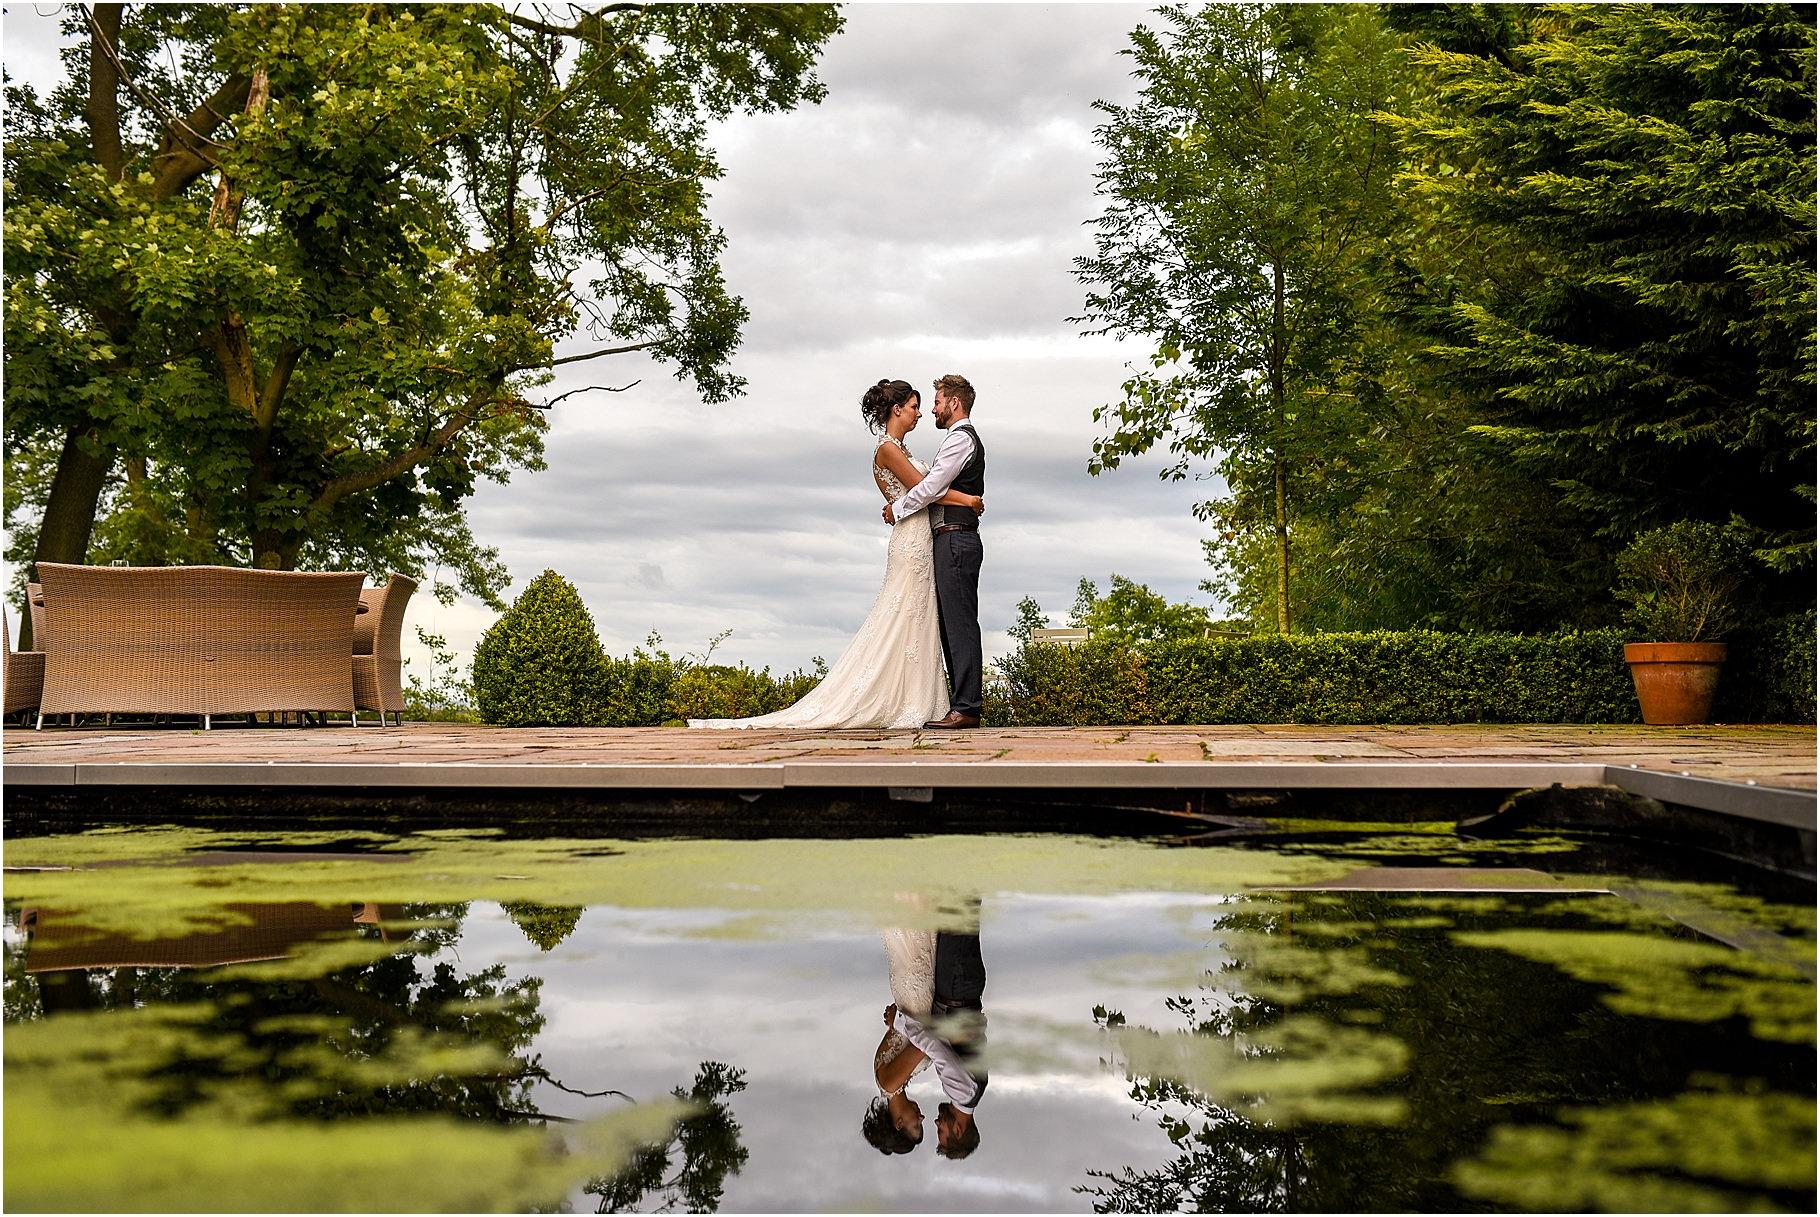 dan-wootton-photography-2017-weddings-024.jpg